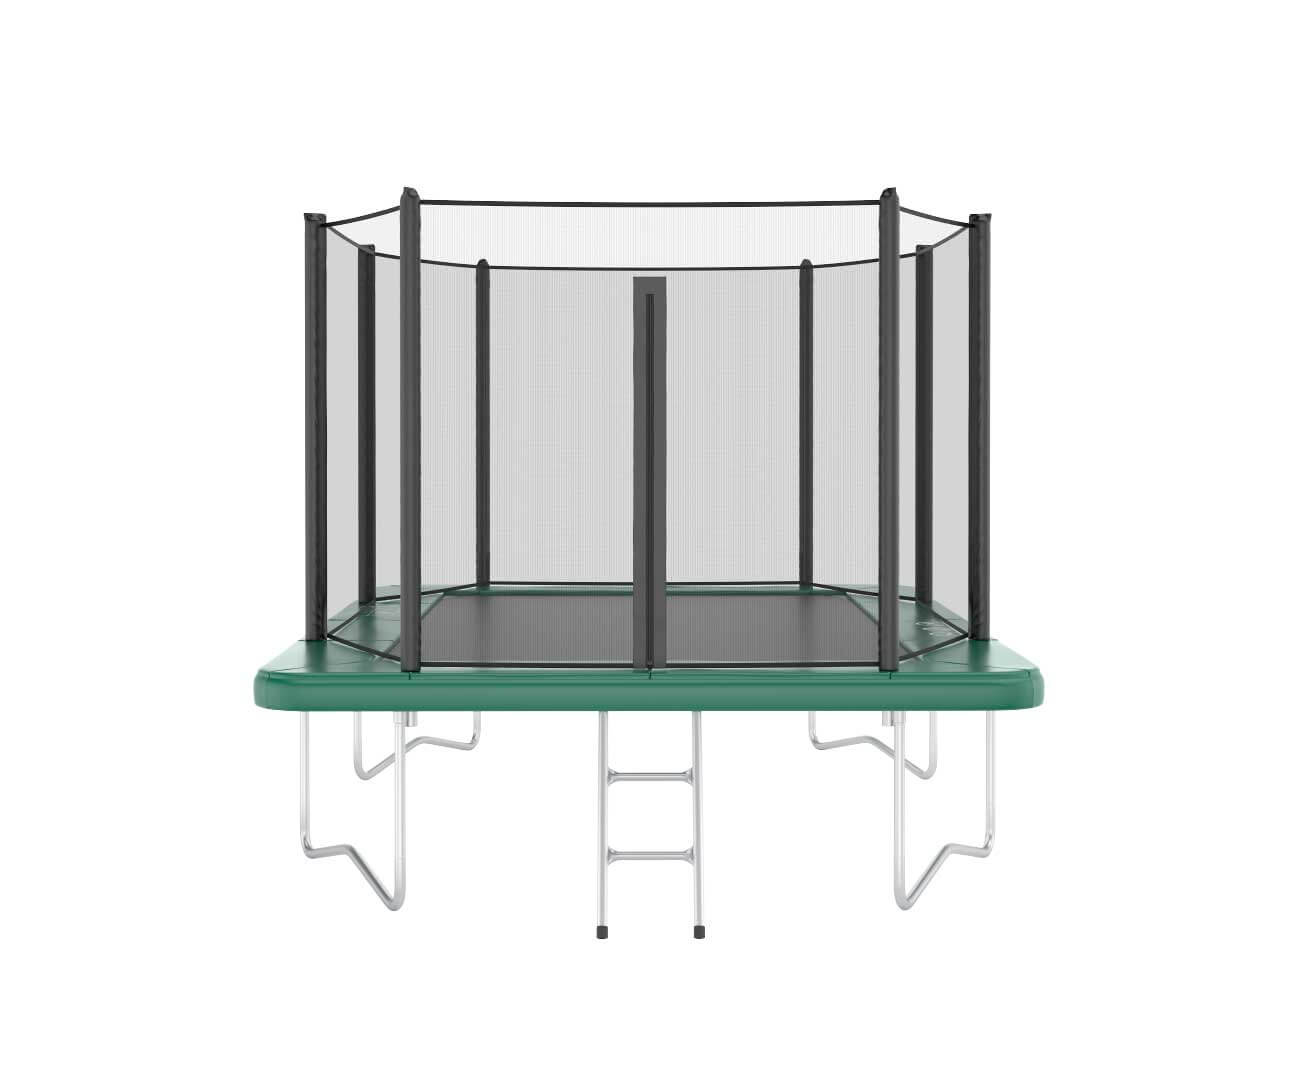 Akrobat Orbit 11x8 Green safety pad/Black jumping mat